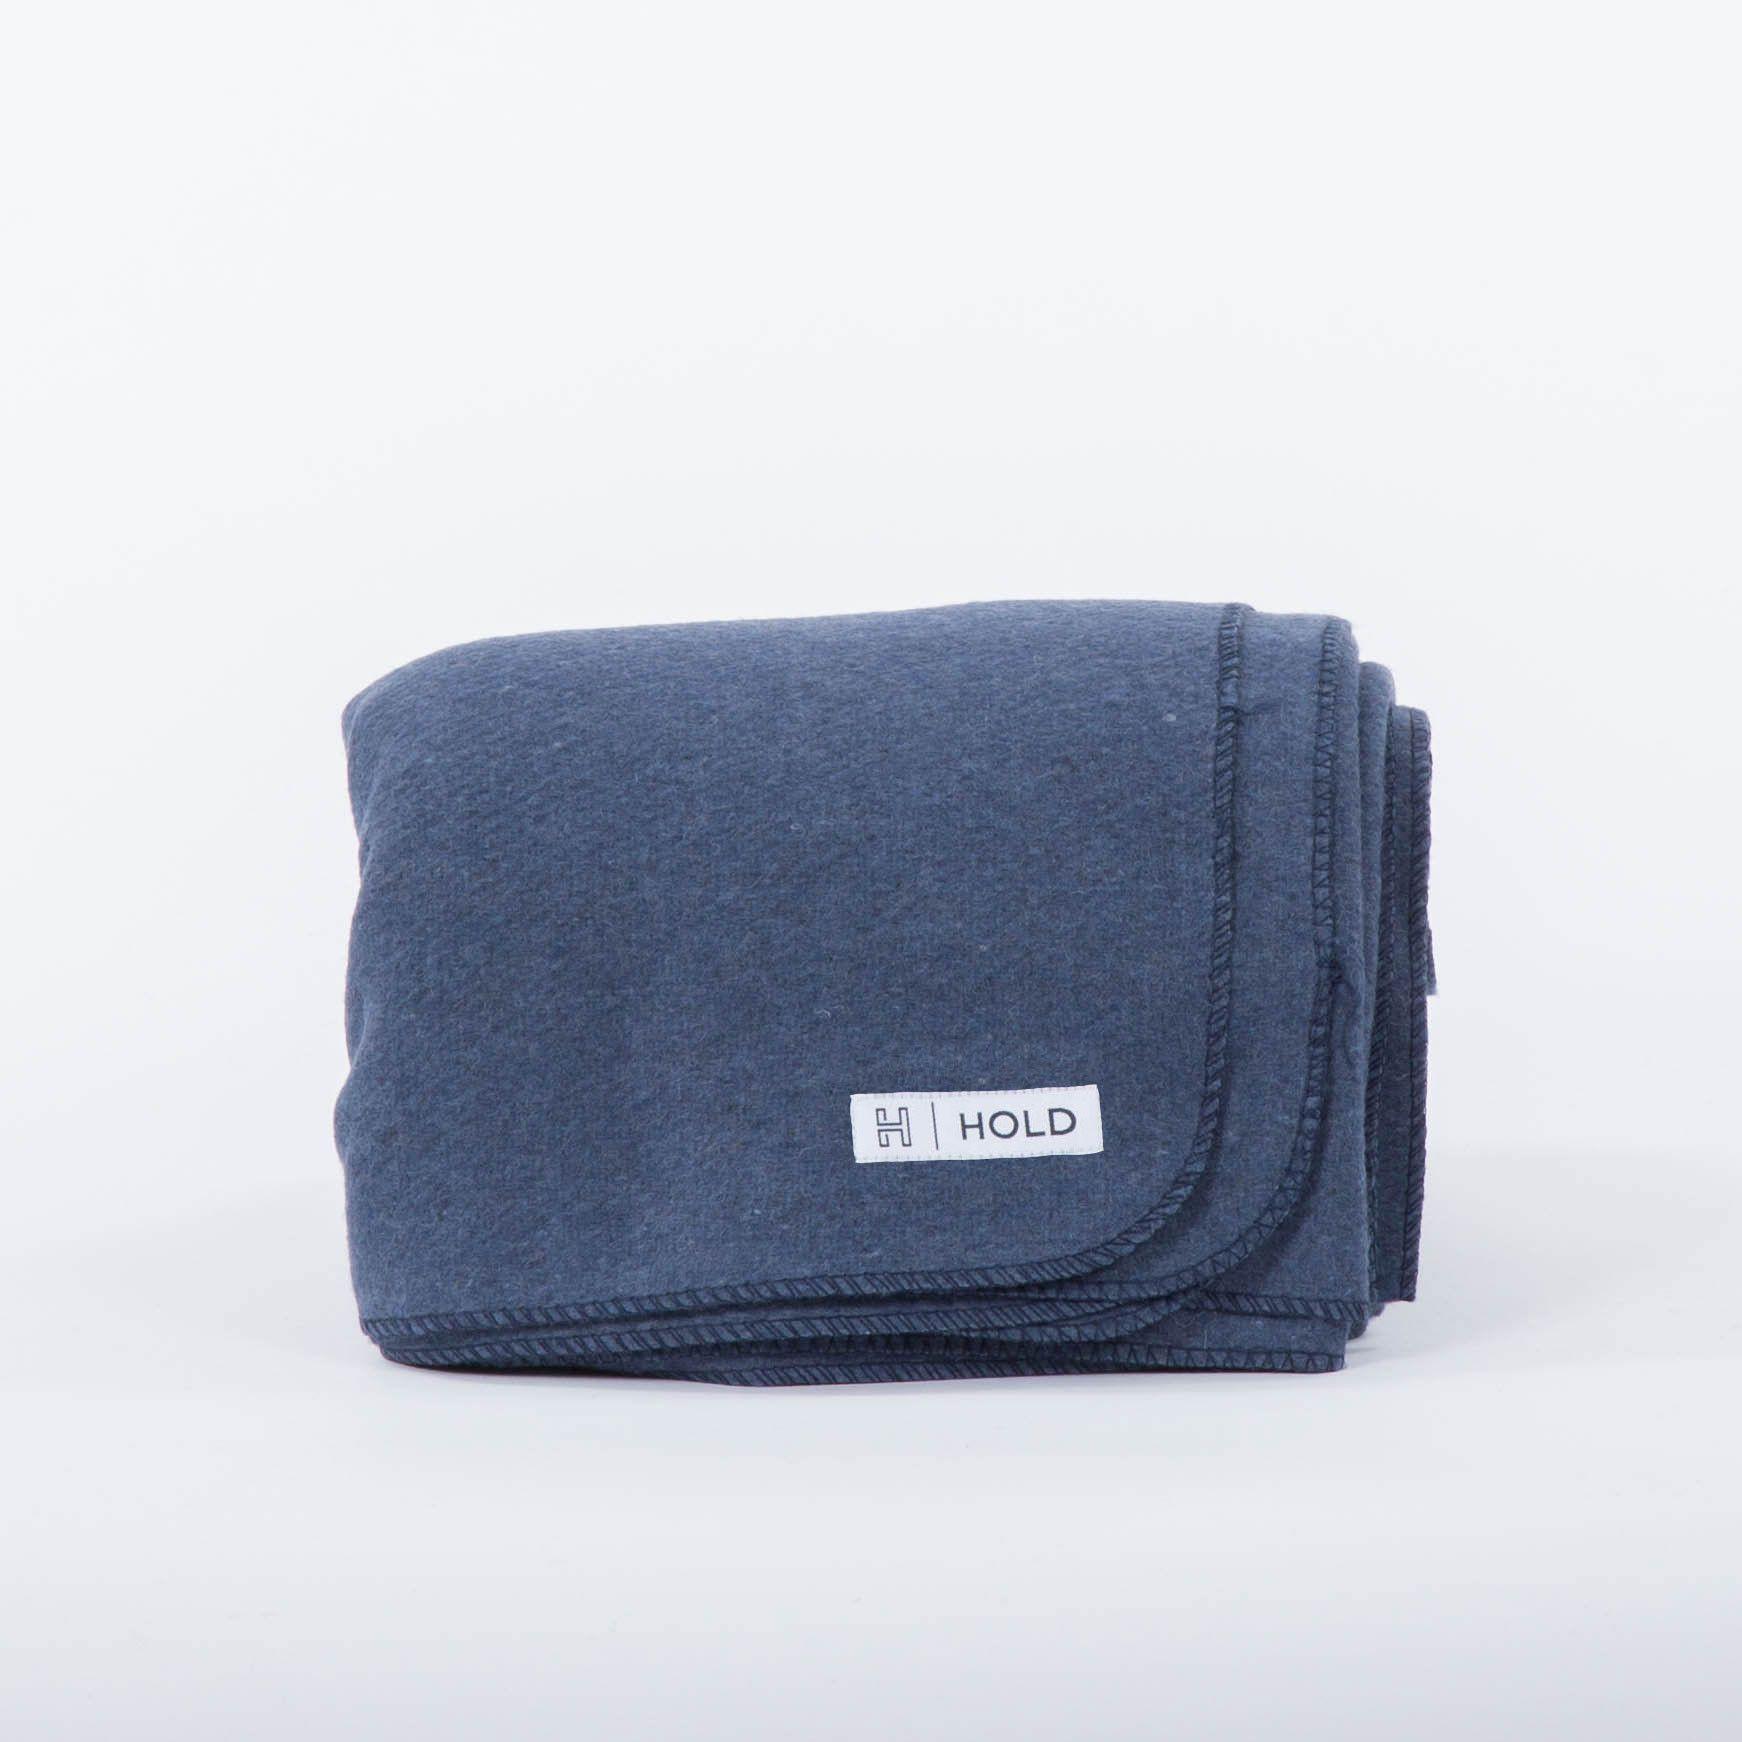 Hold - Indigo Blanket